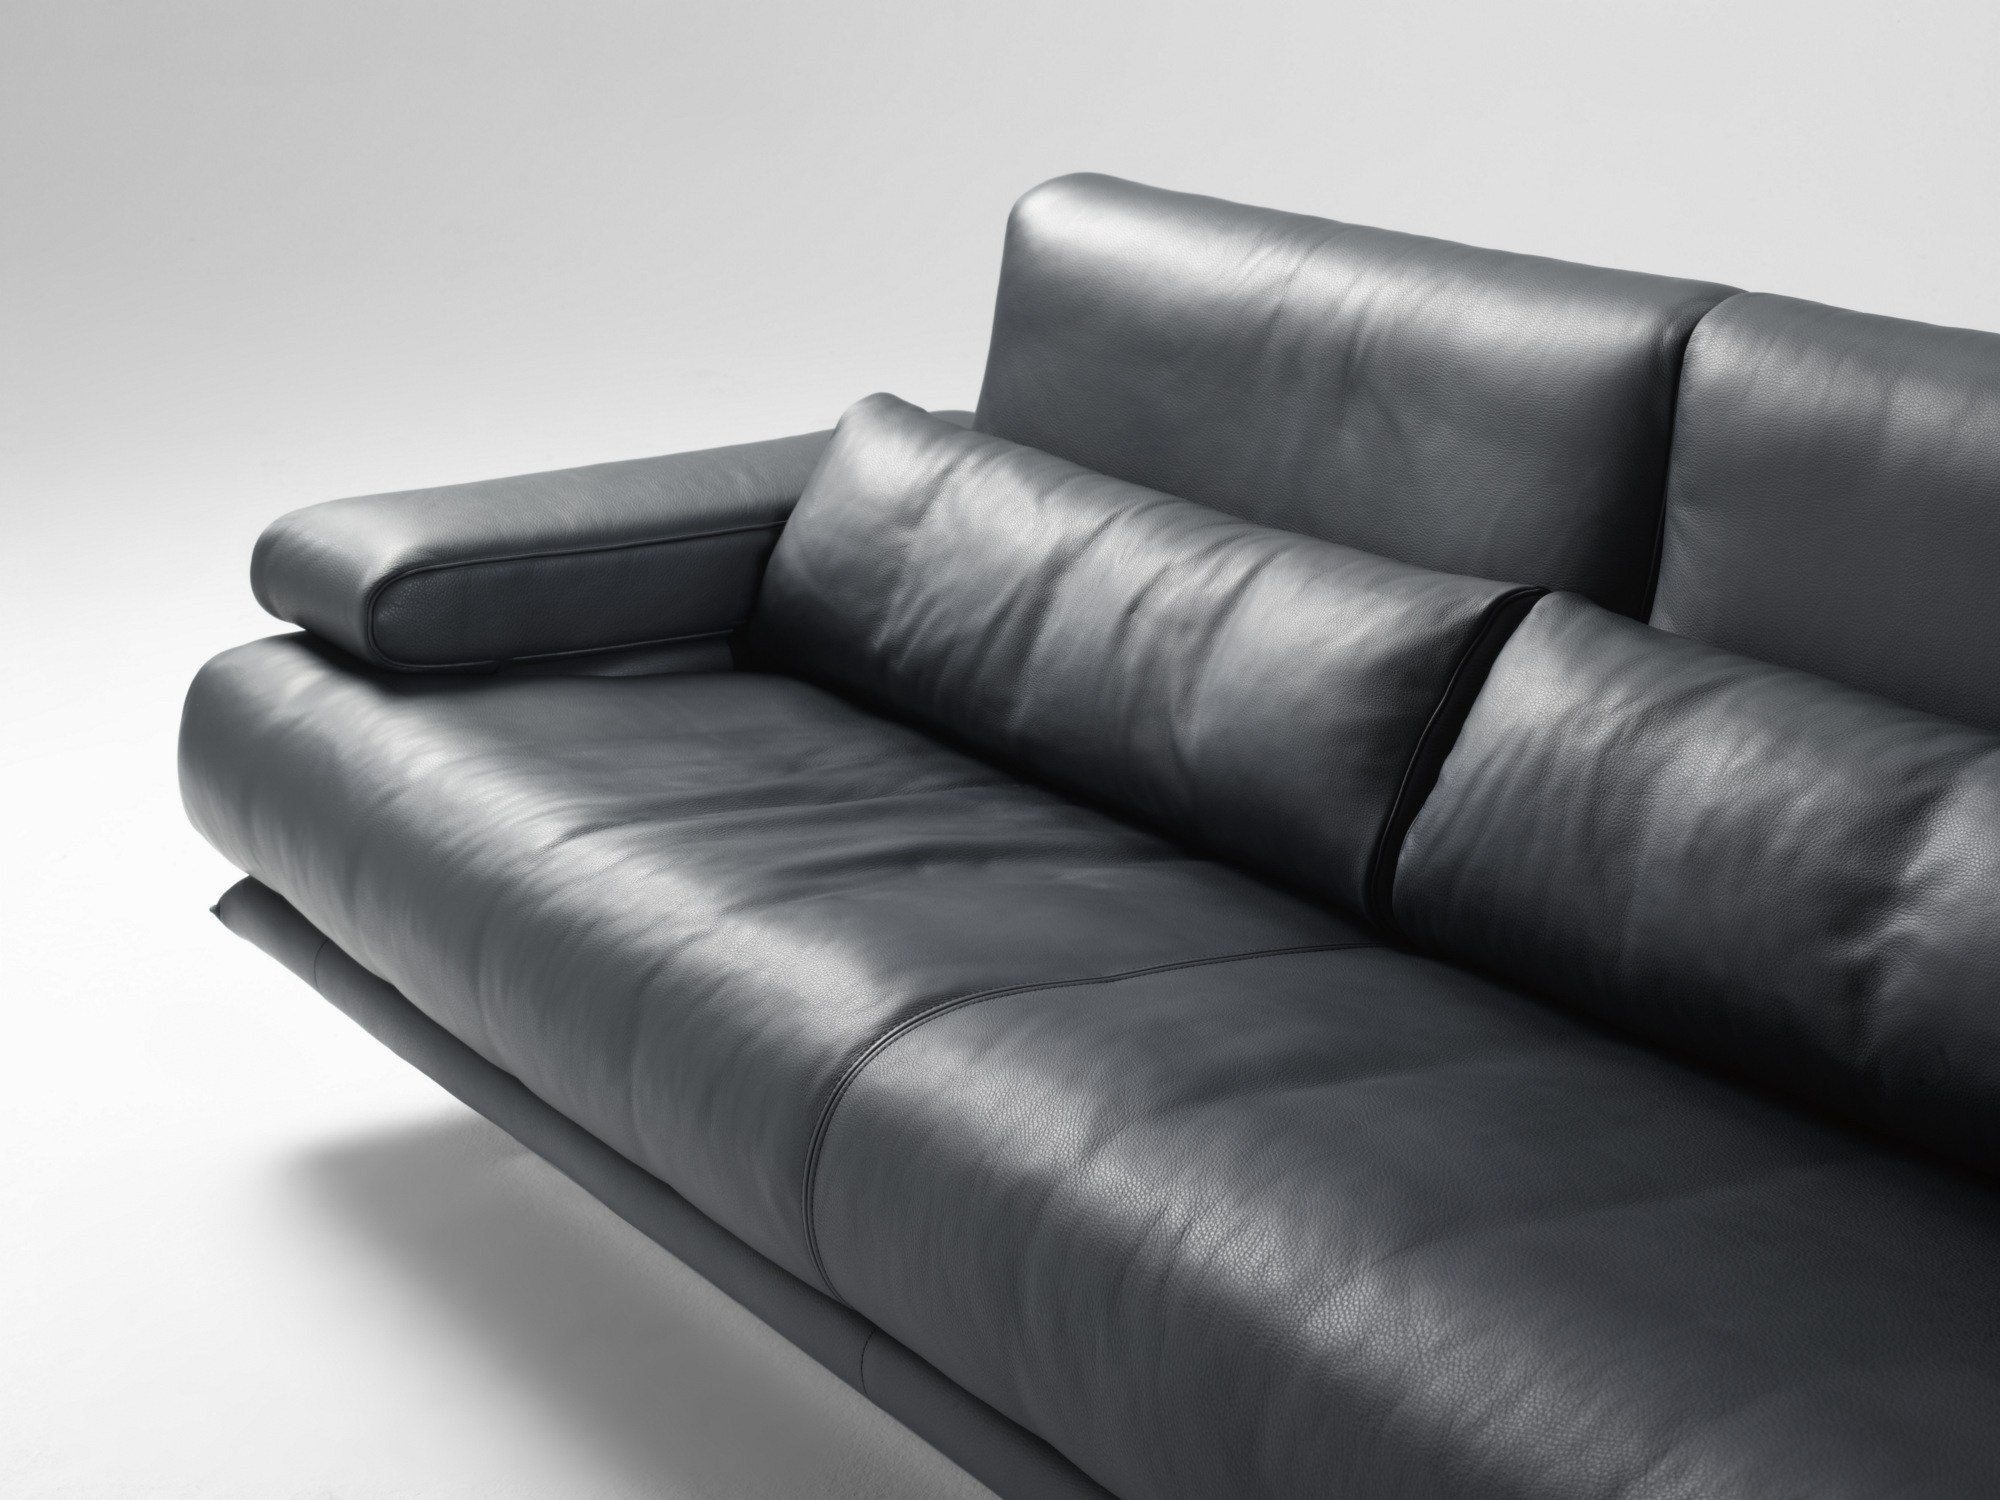 rolf benz 6500 divano by rolf benz design mathias hoffman. Black Bedroom Furniture Sets. Home Design Ideas